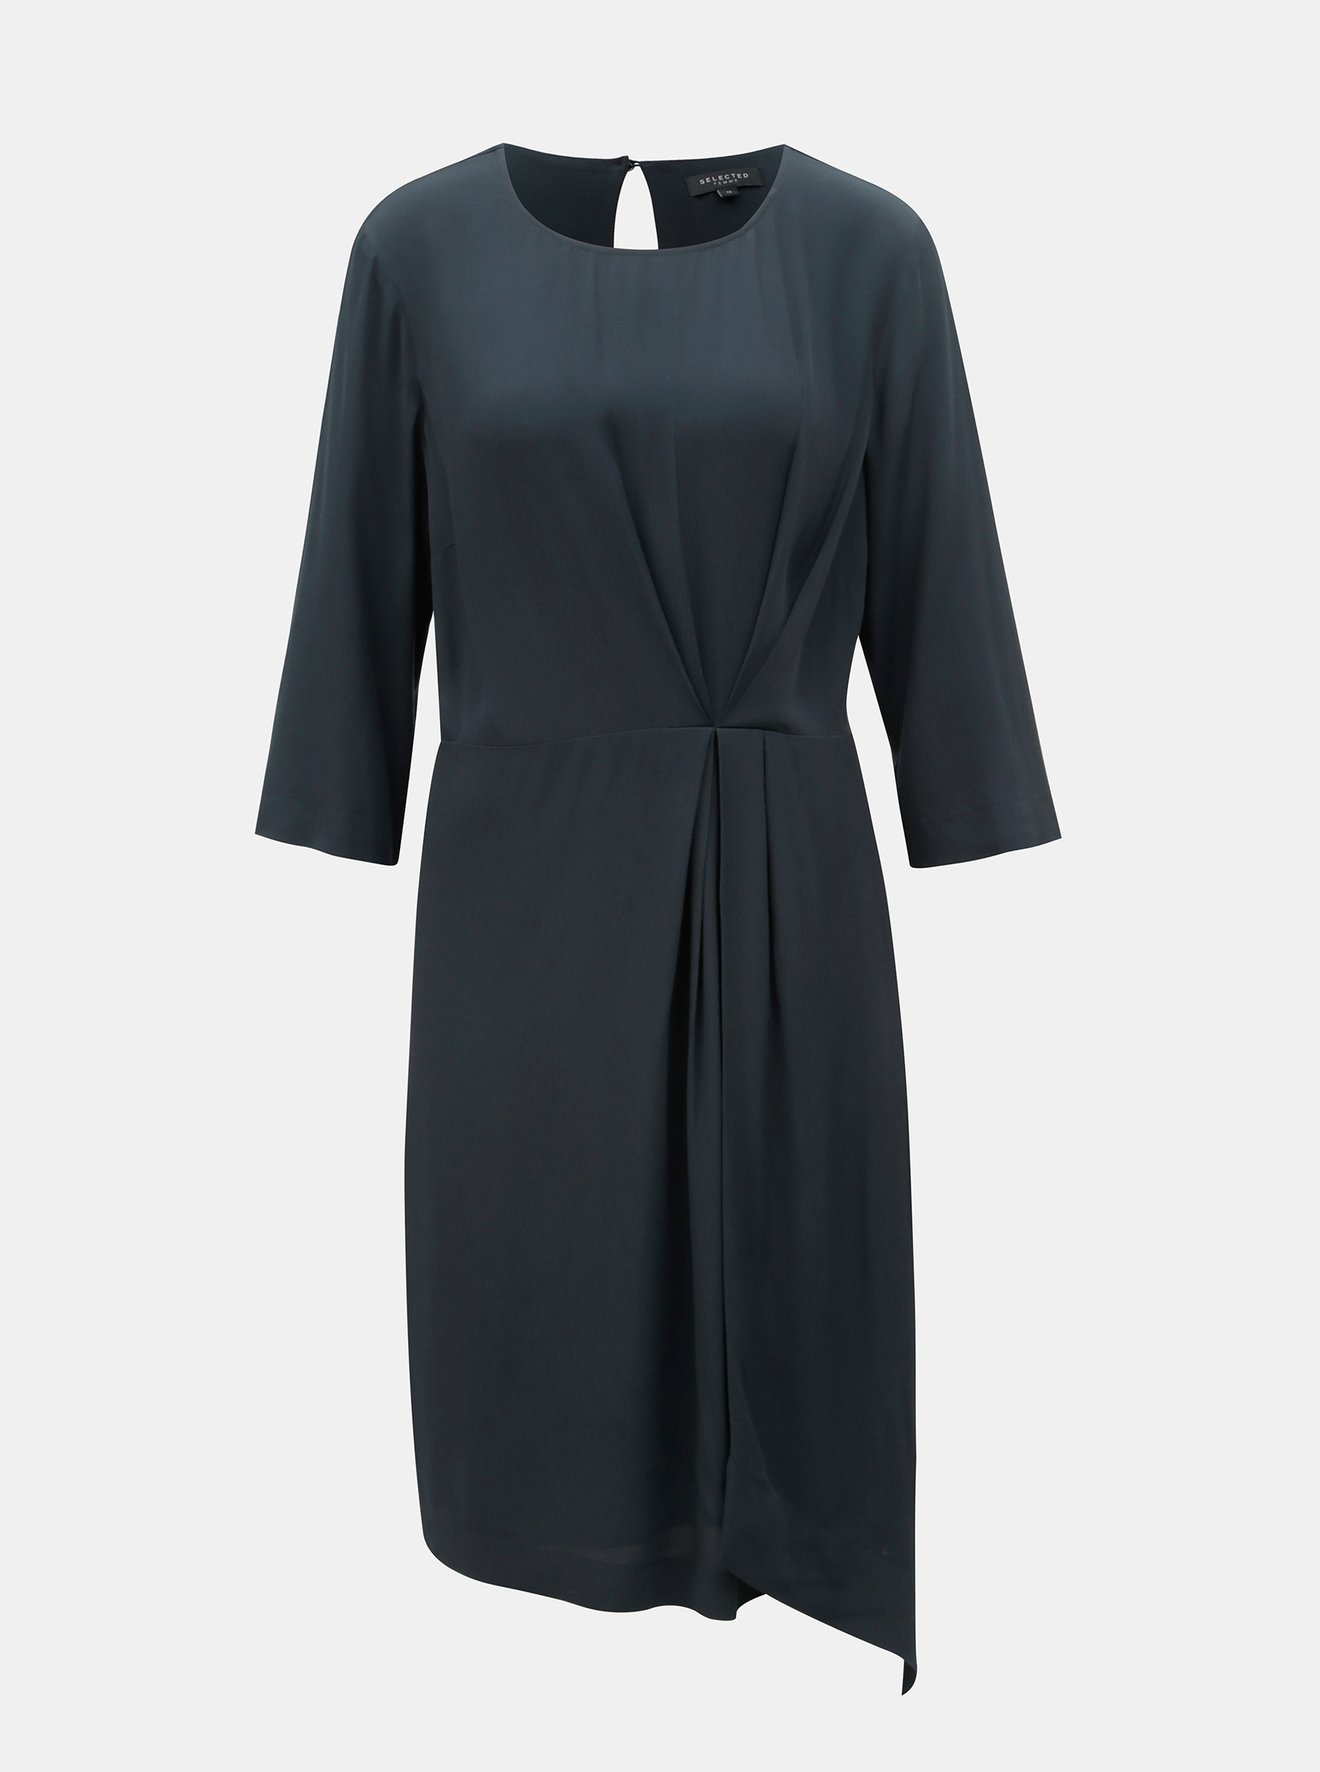 9ae4d8d72fad Tmavě modré šaty s řasením na boku Selected Femme Kiara